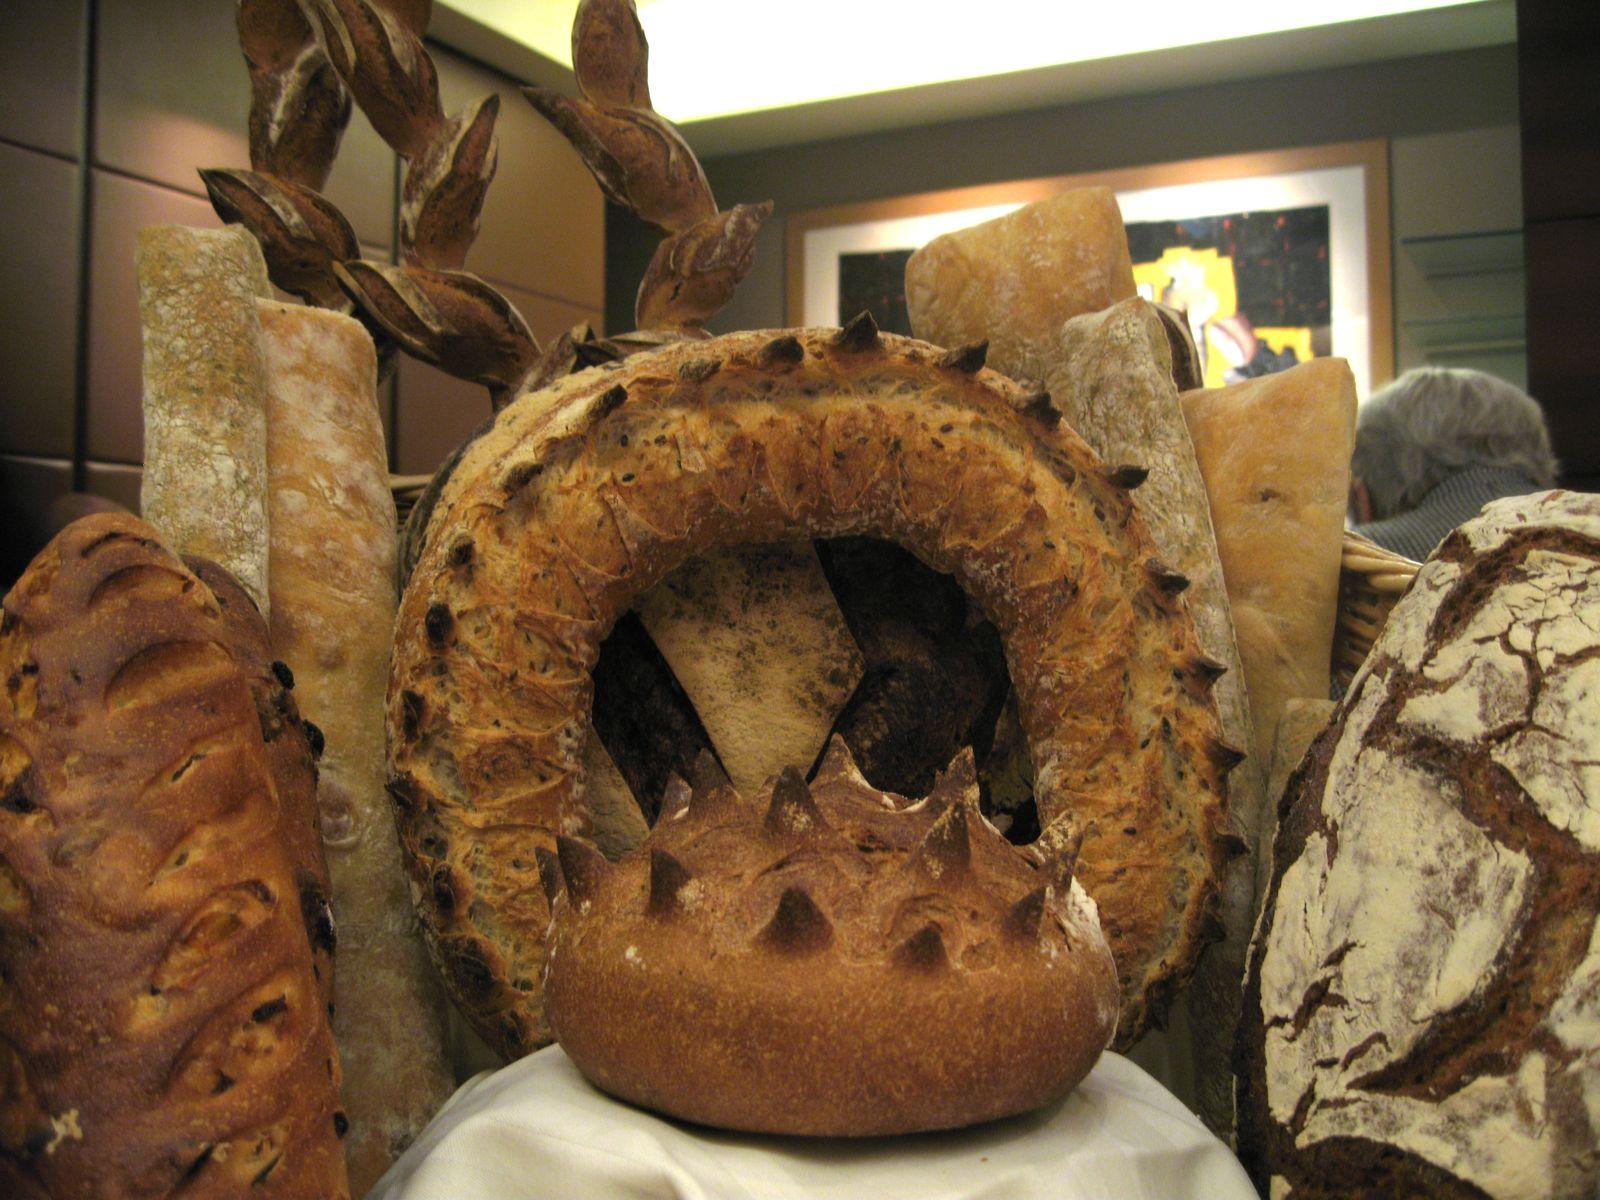 The Bread Trolly